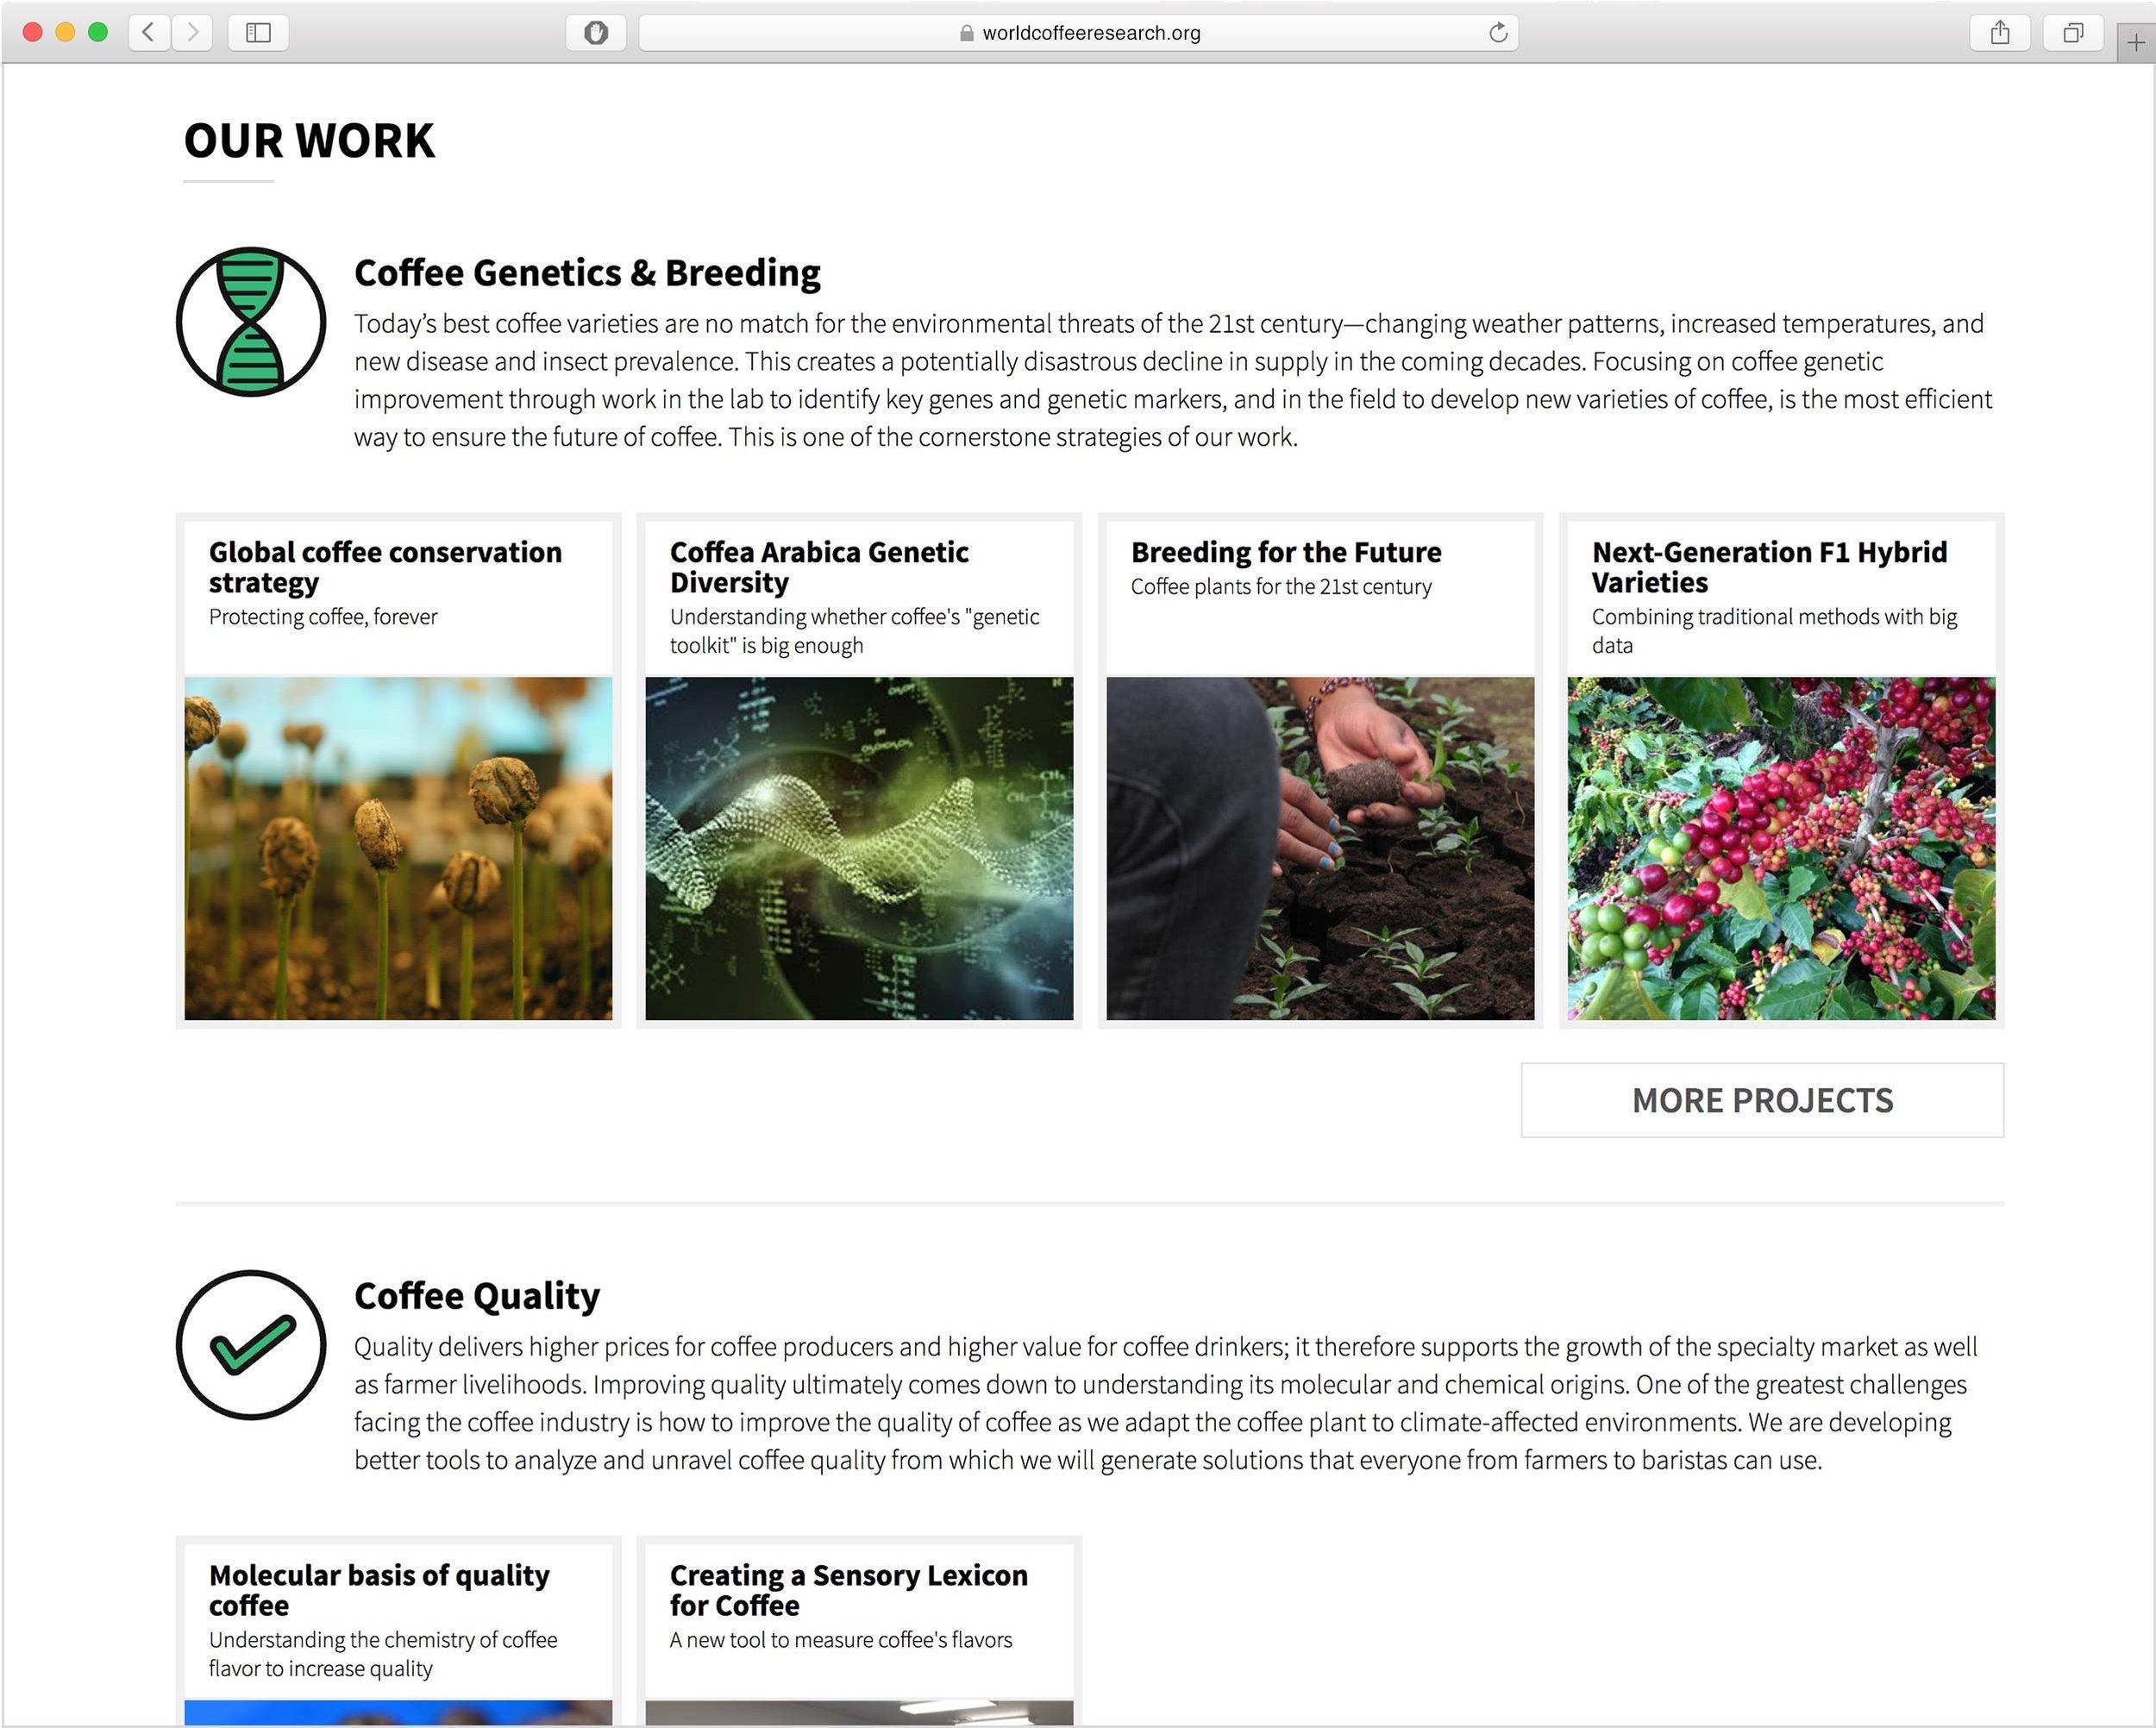 Portfolio_2017_Design_WCR_Website_Work_2500.jpg